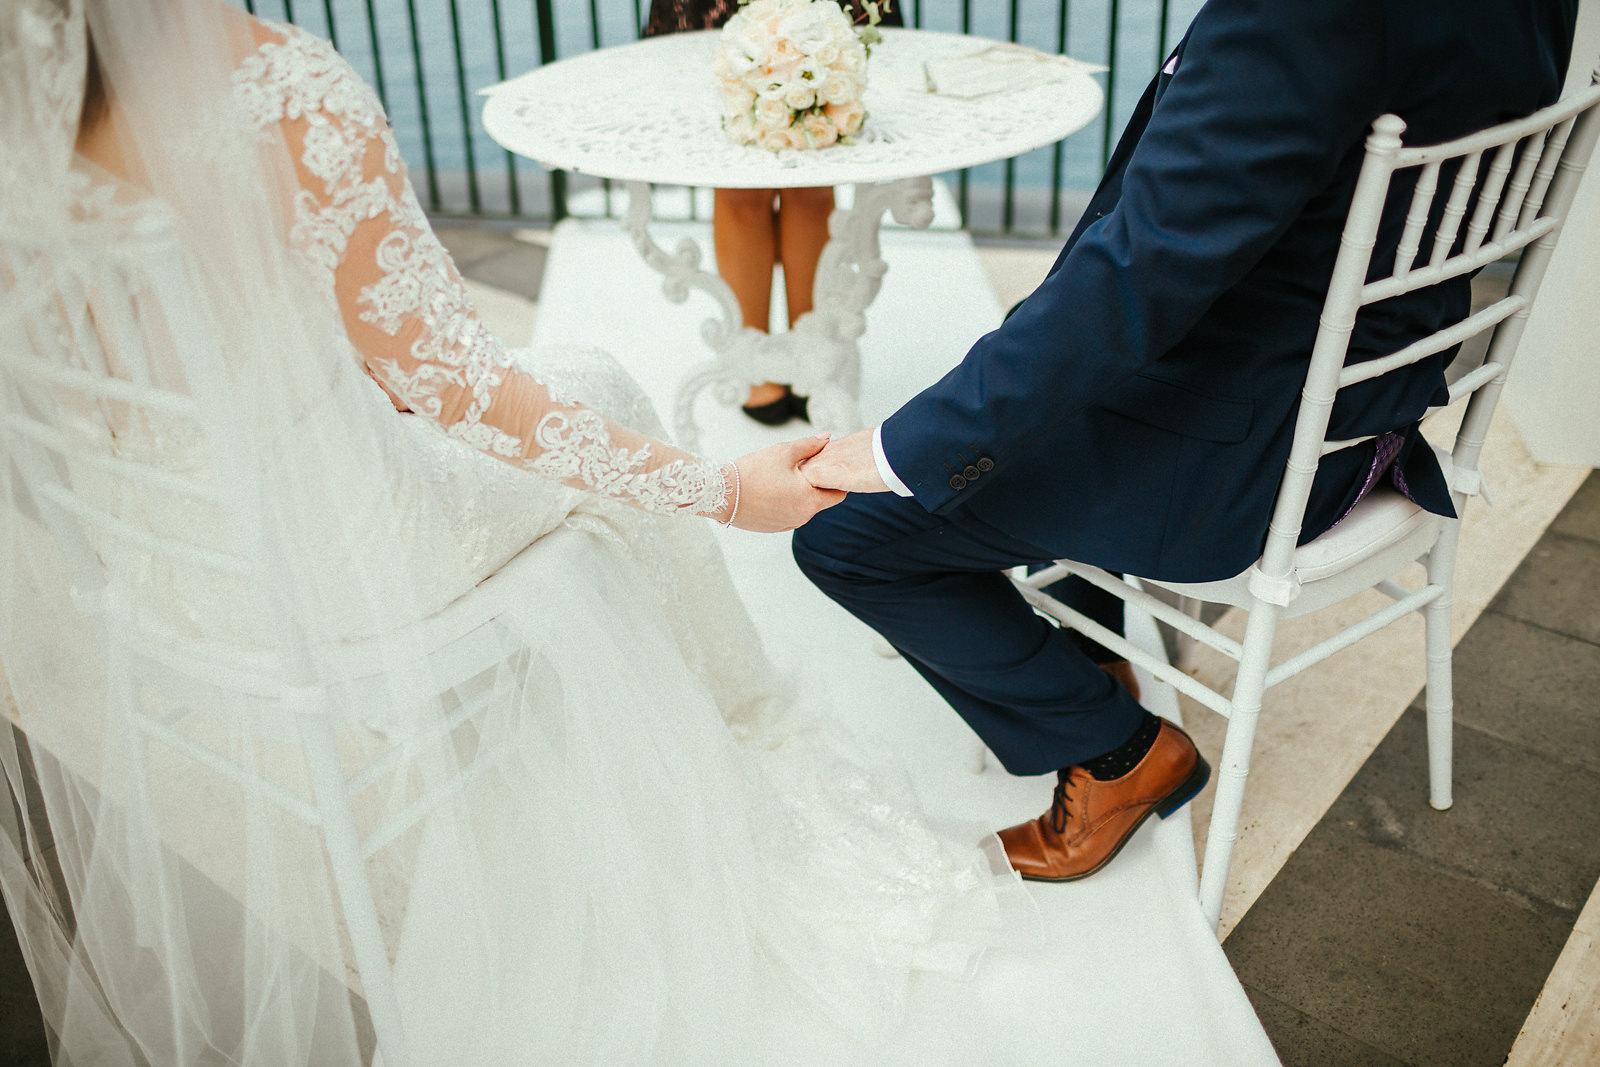 Wedding ceremony at Villa Antiche Mura photographer